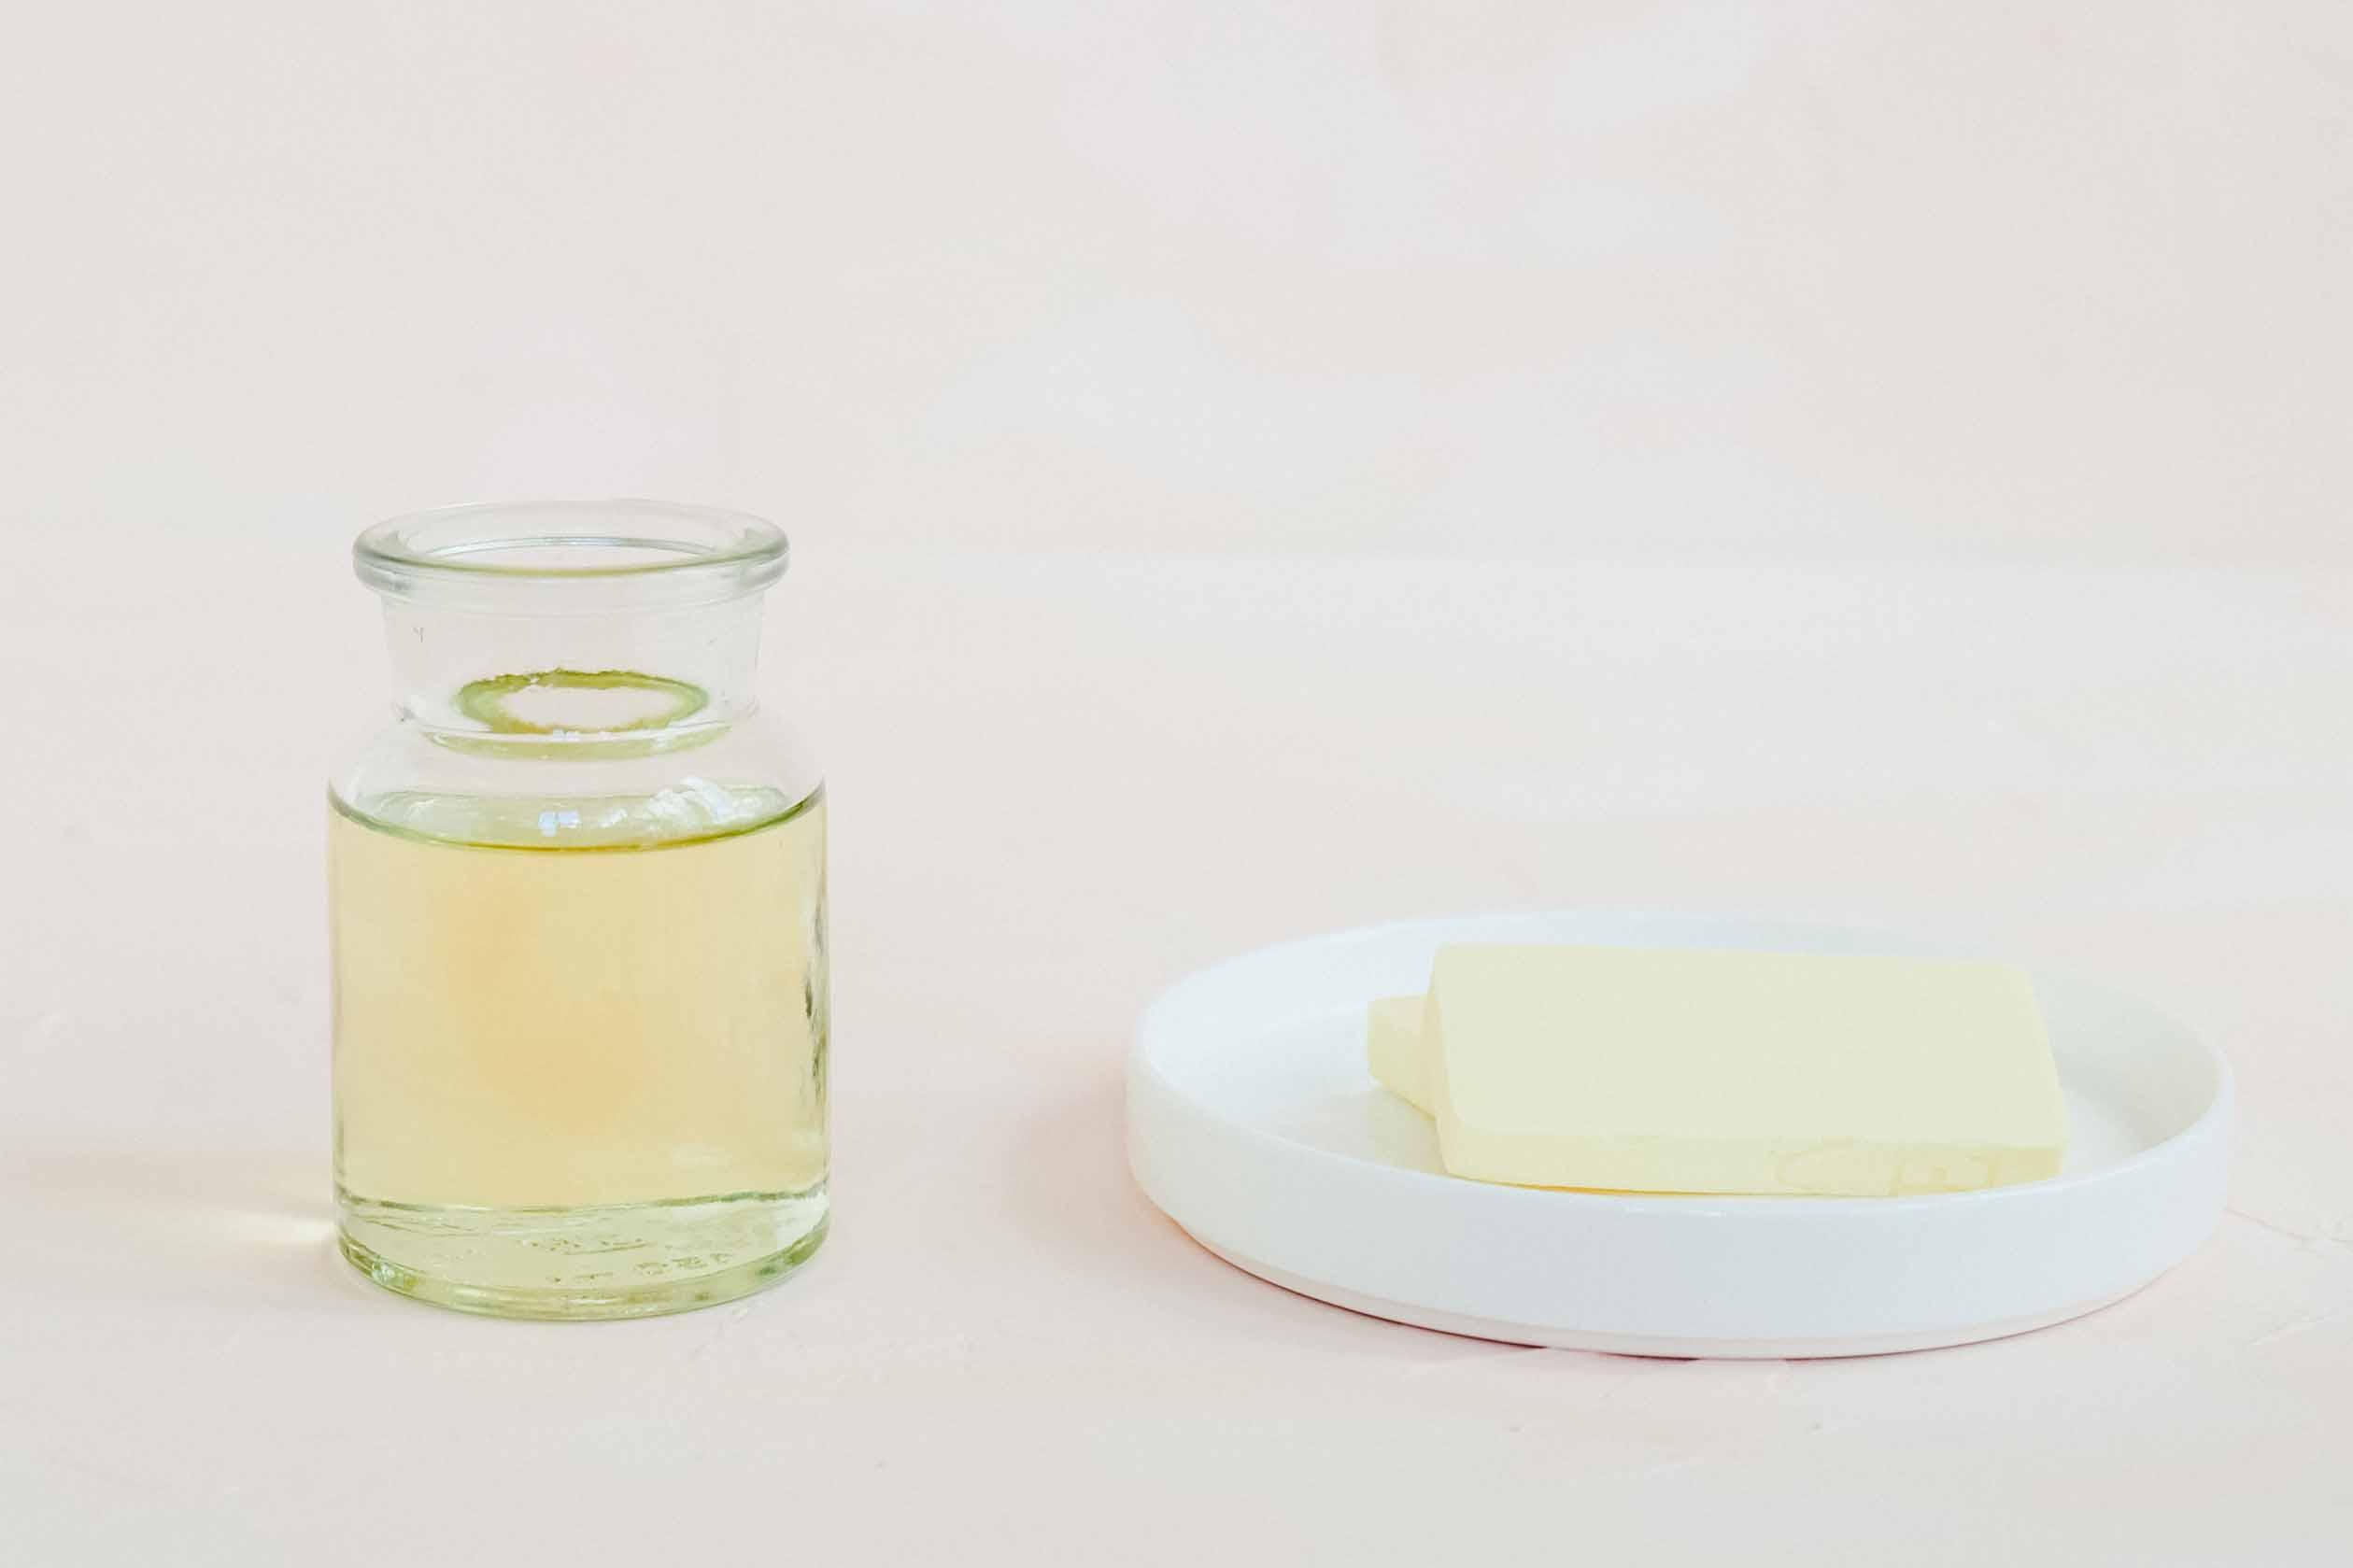 Butter Durch Apfelmus Ersetzen